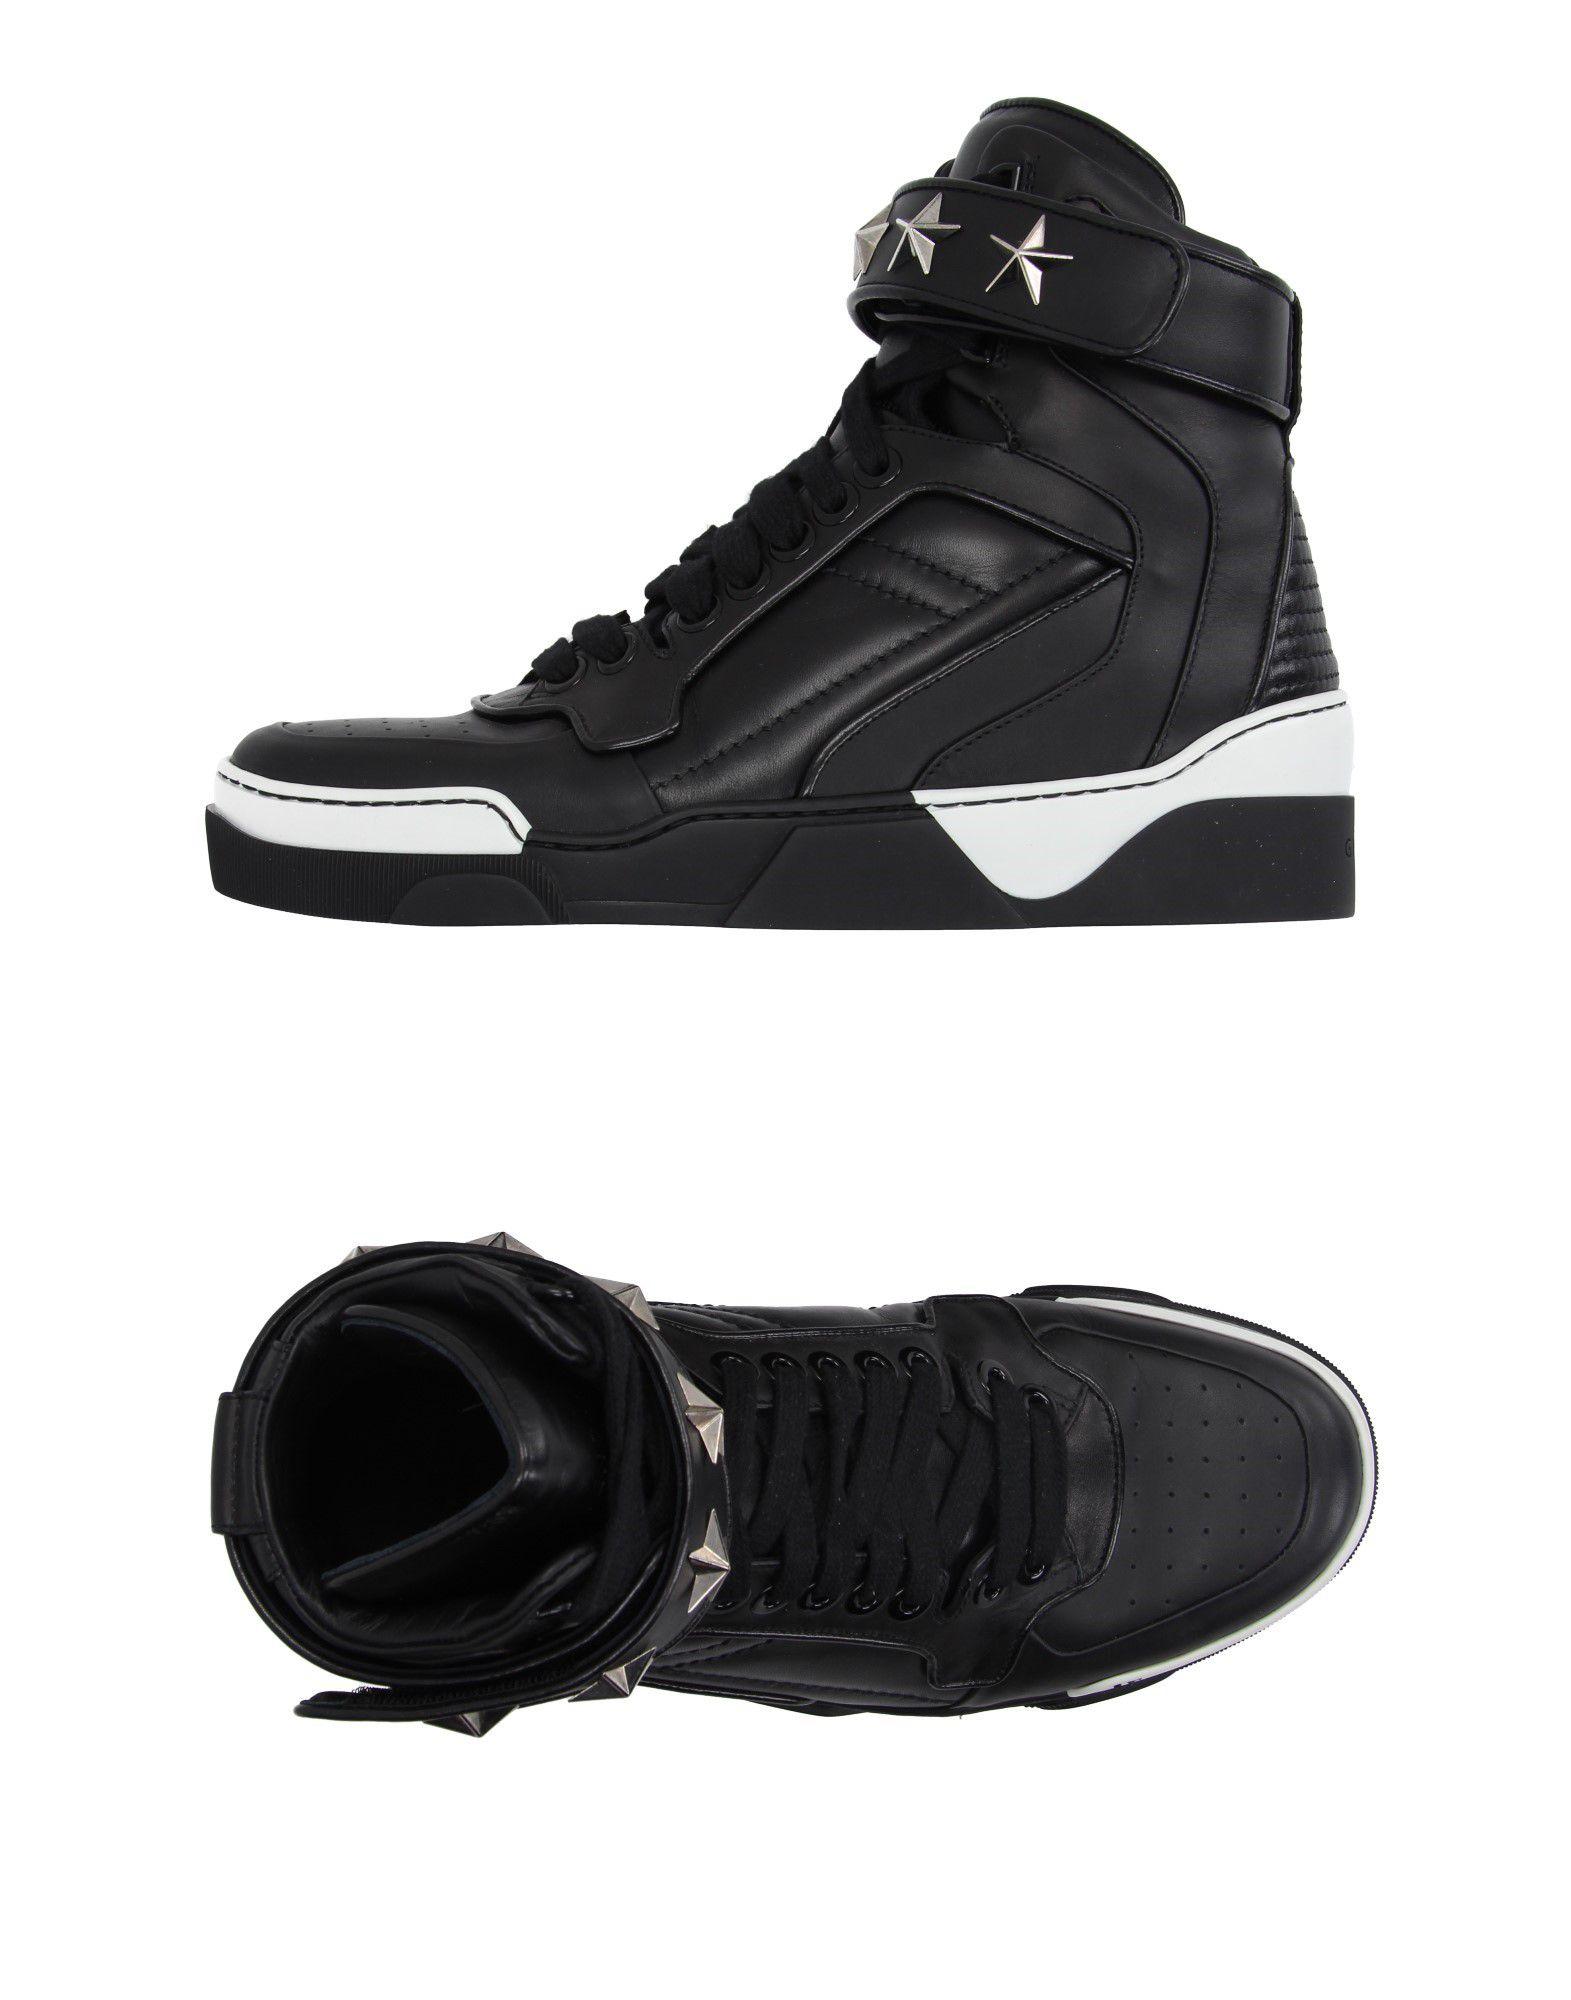 Givenchy Sneakers Herren  11019403FI Gute Qualität beliebte Schuhe